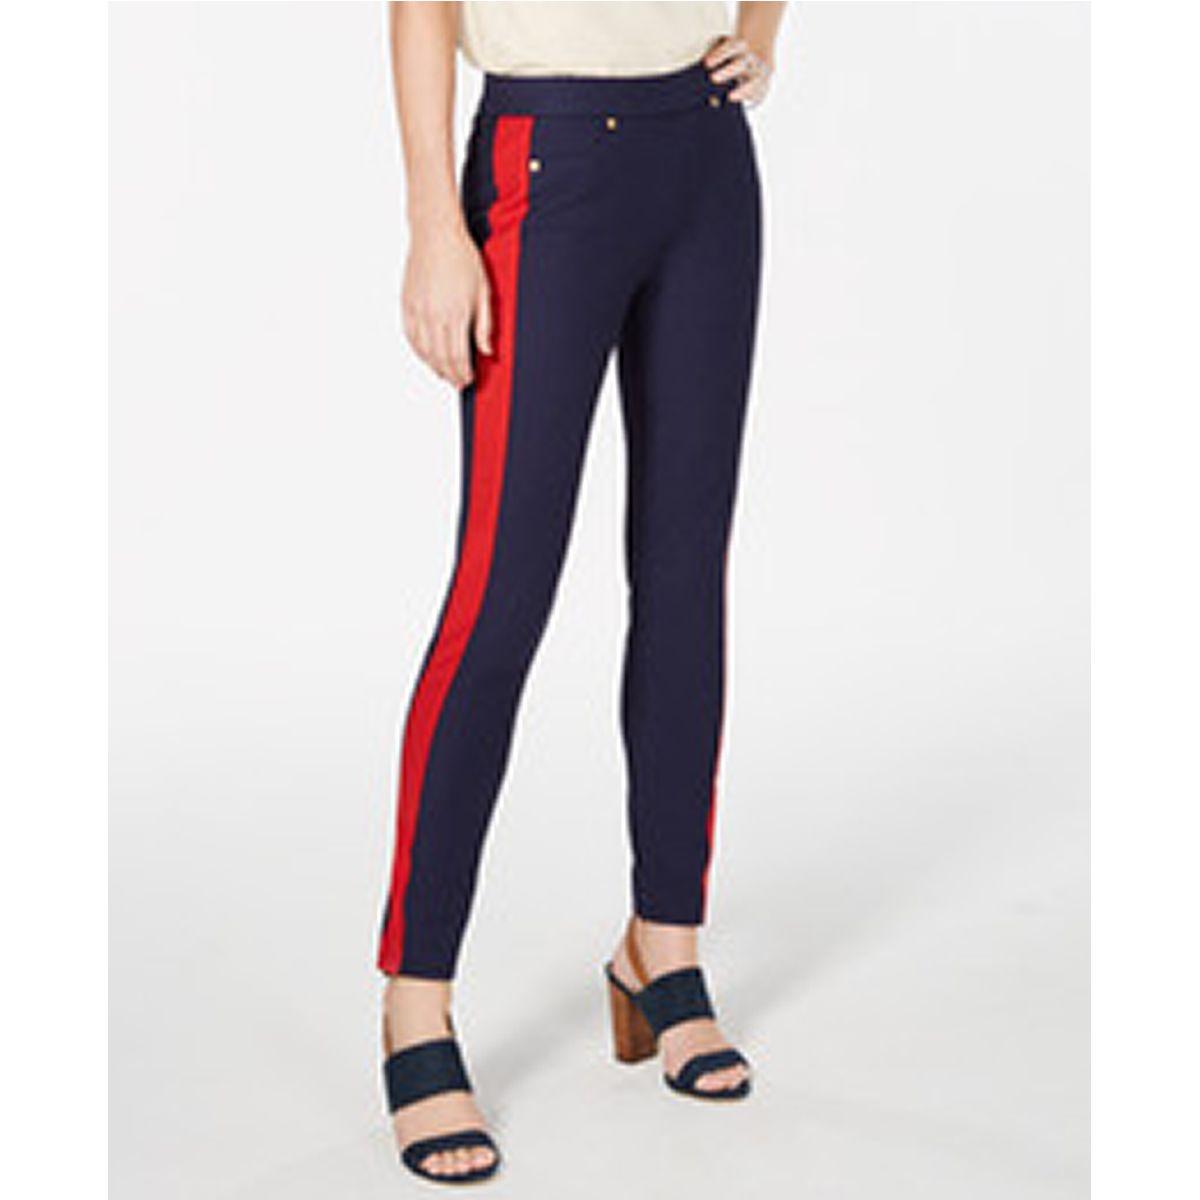 9c64af90516 MICHAEL Michael Kors Clothing for Women - Macy s